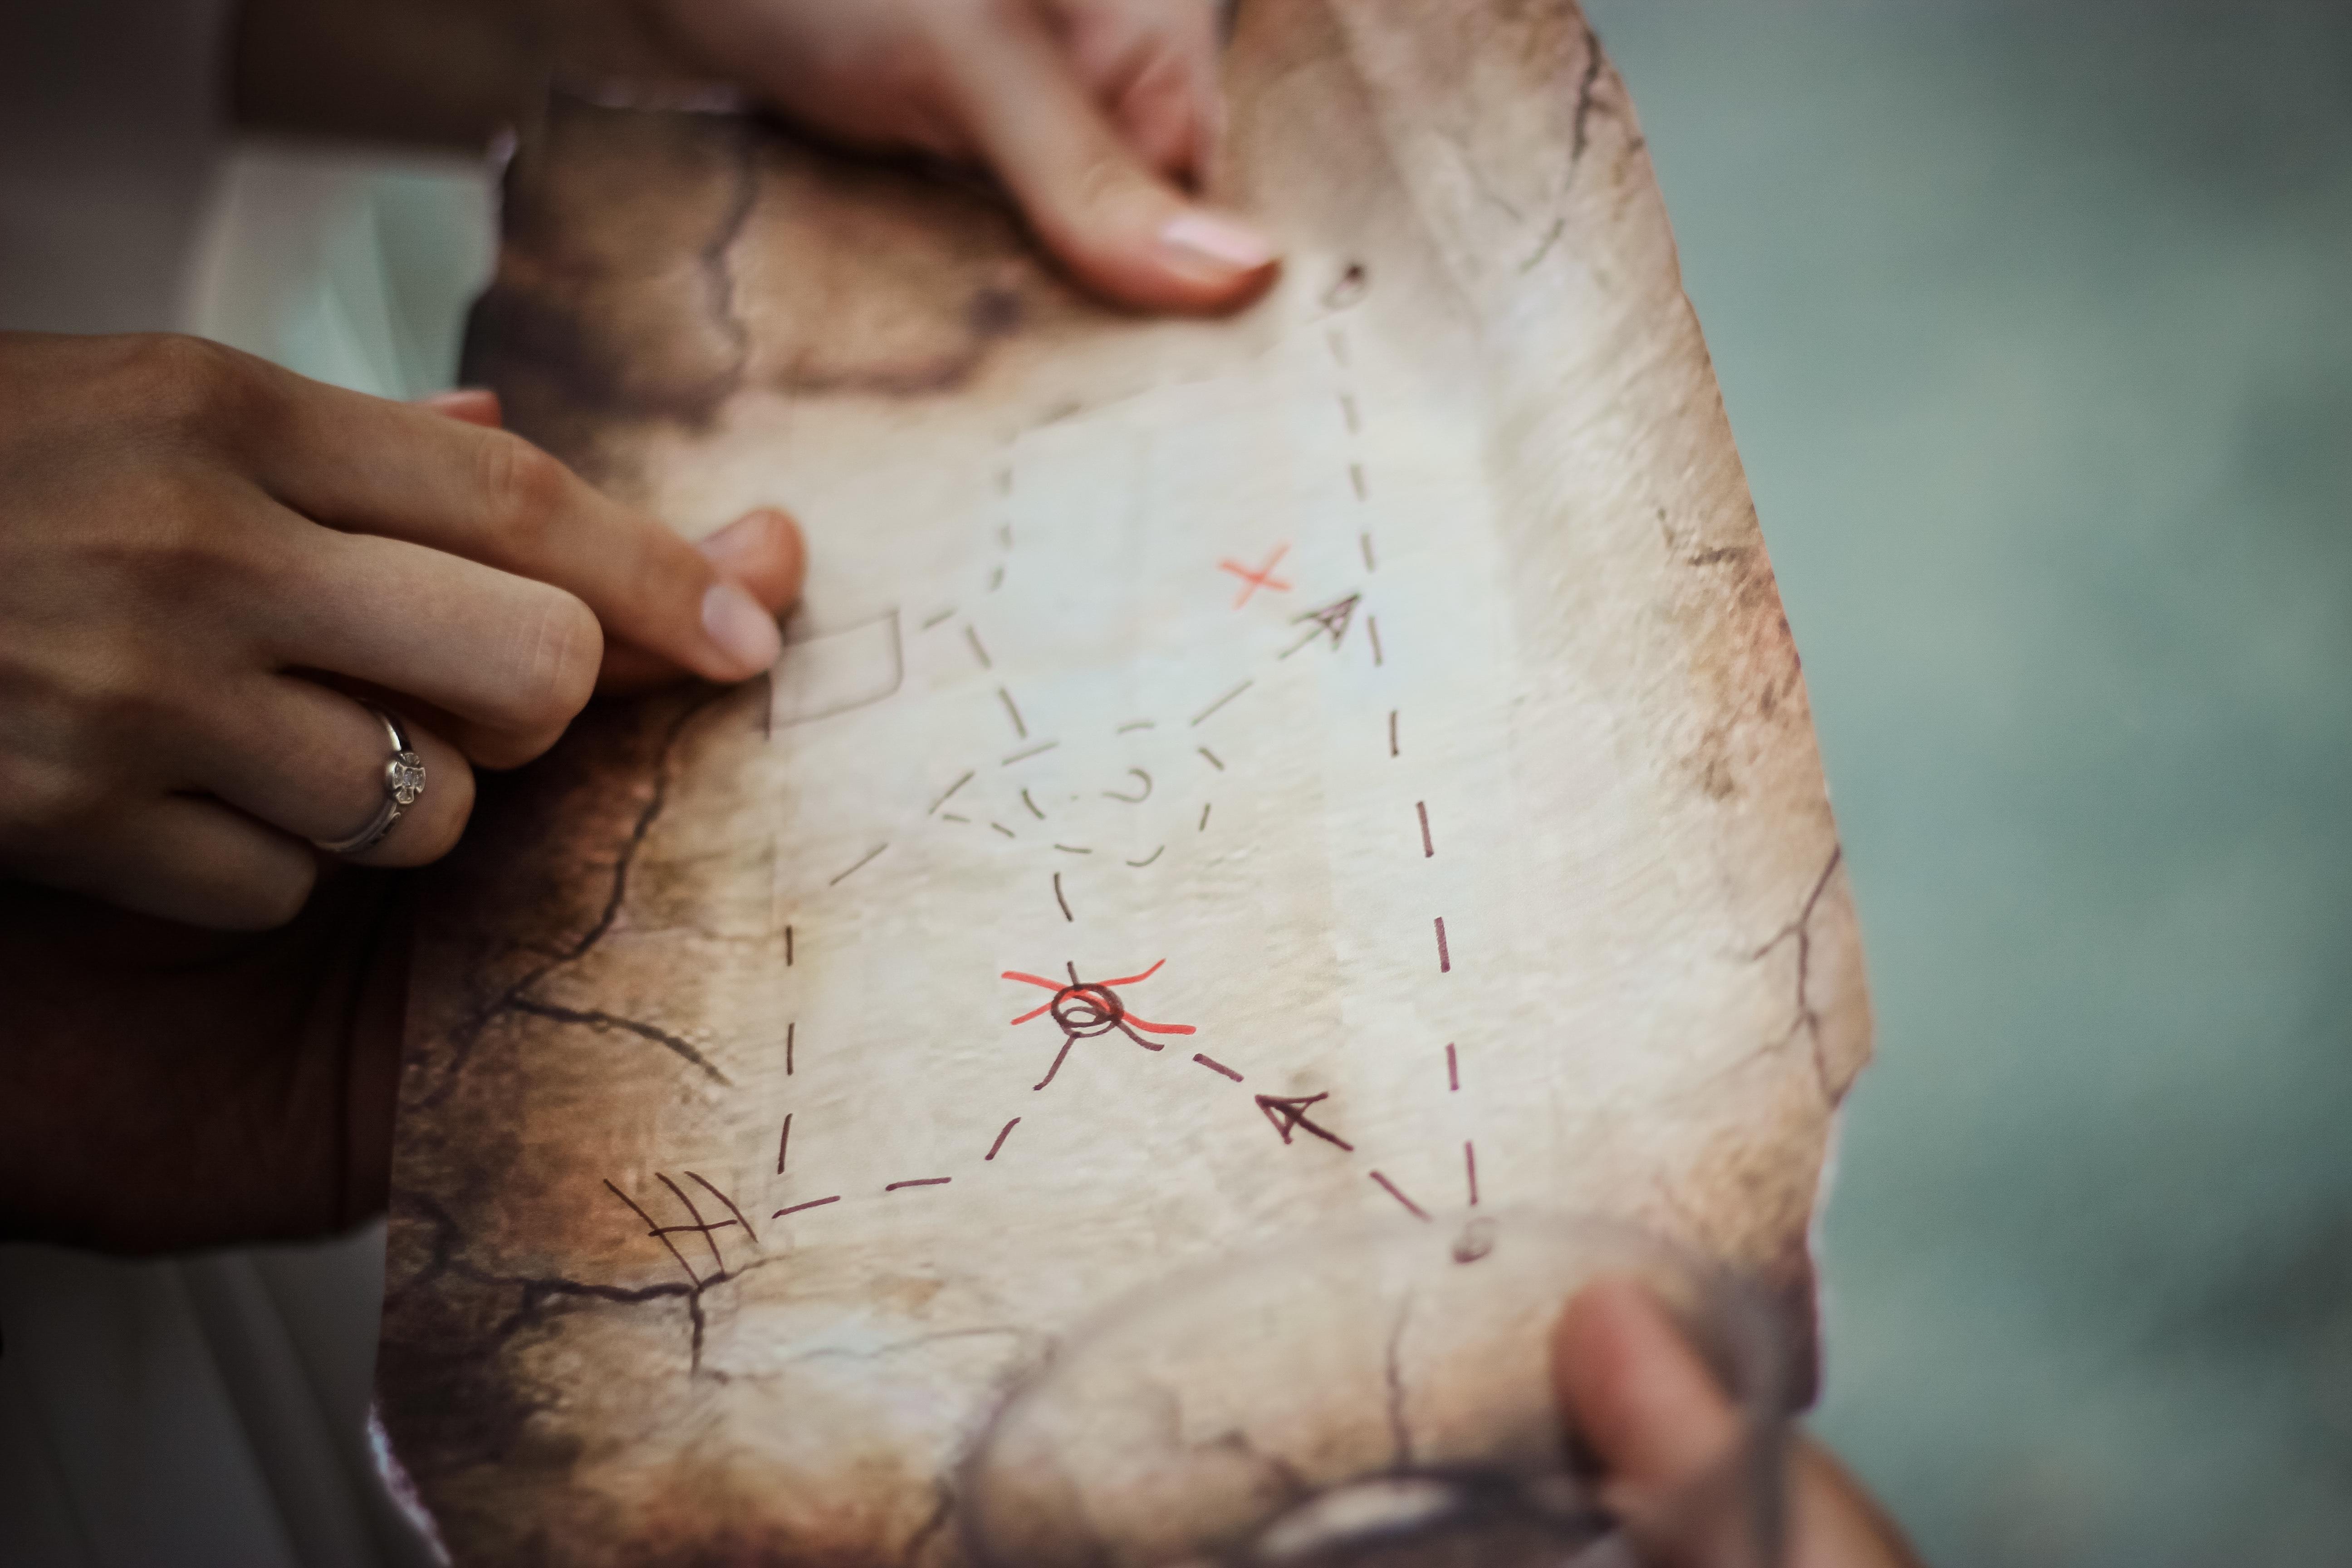 Fotos gratis : mano, persona, anillo, brazo, mapa, de cerca, cuerpo ...